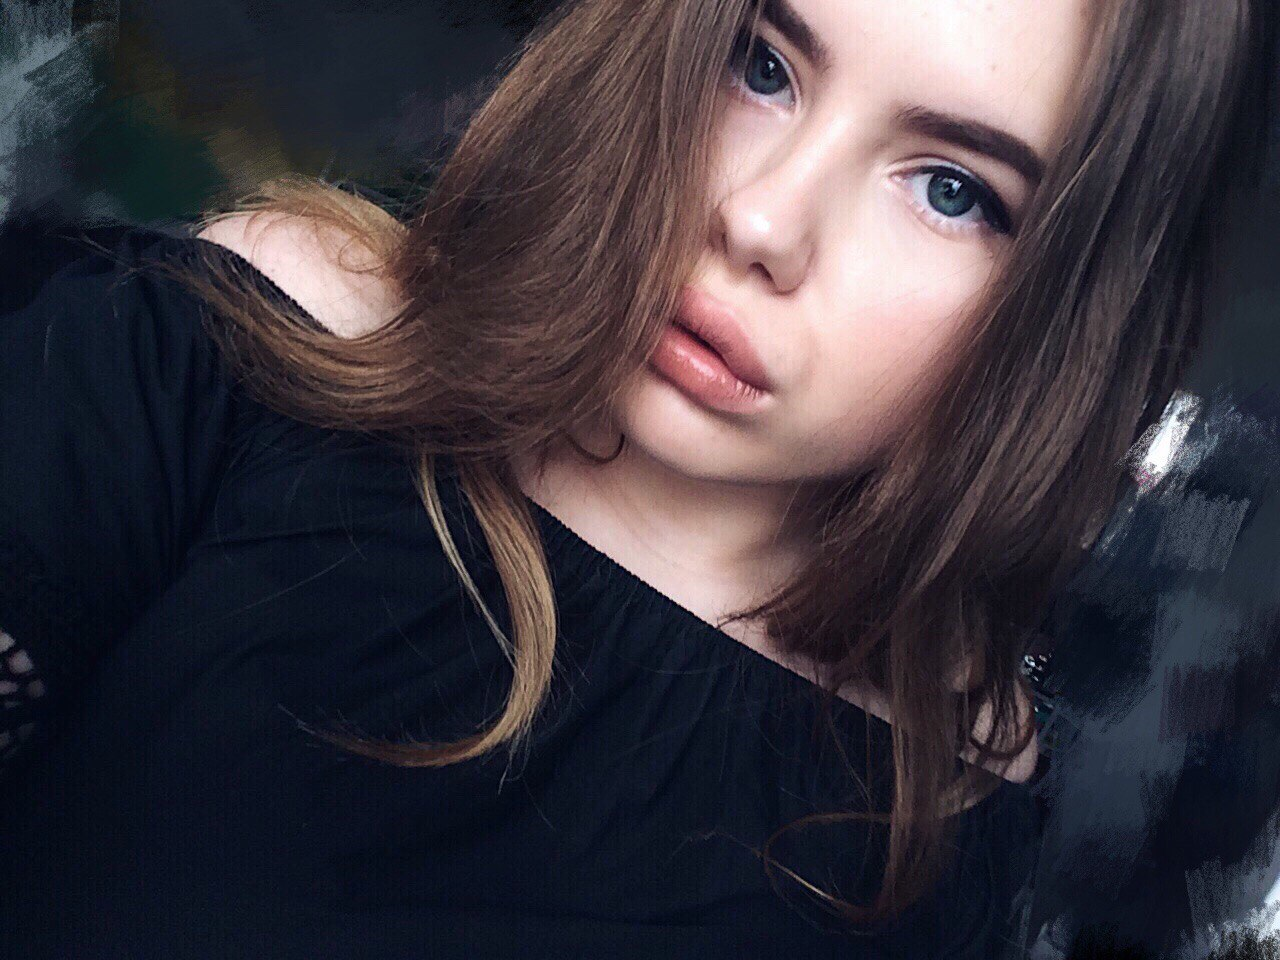 Ольга Дмитриева, Санкт-Петербург - фото №10